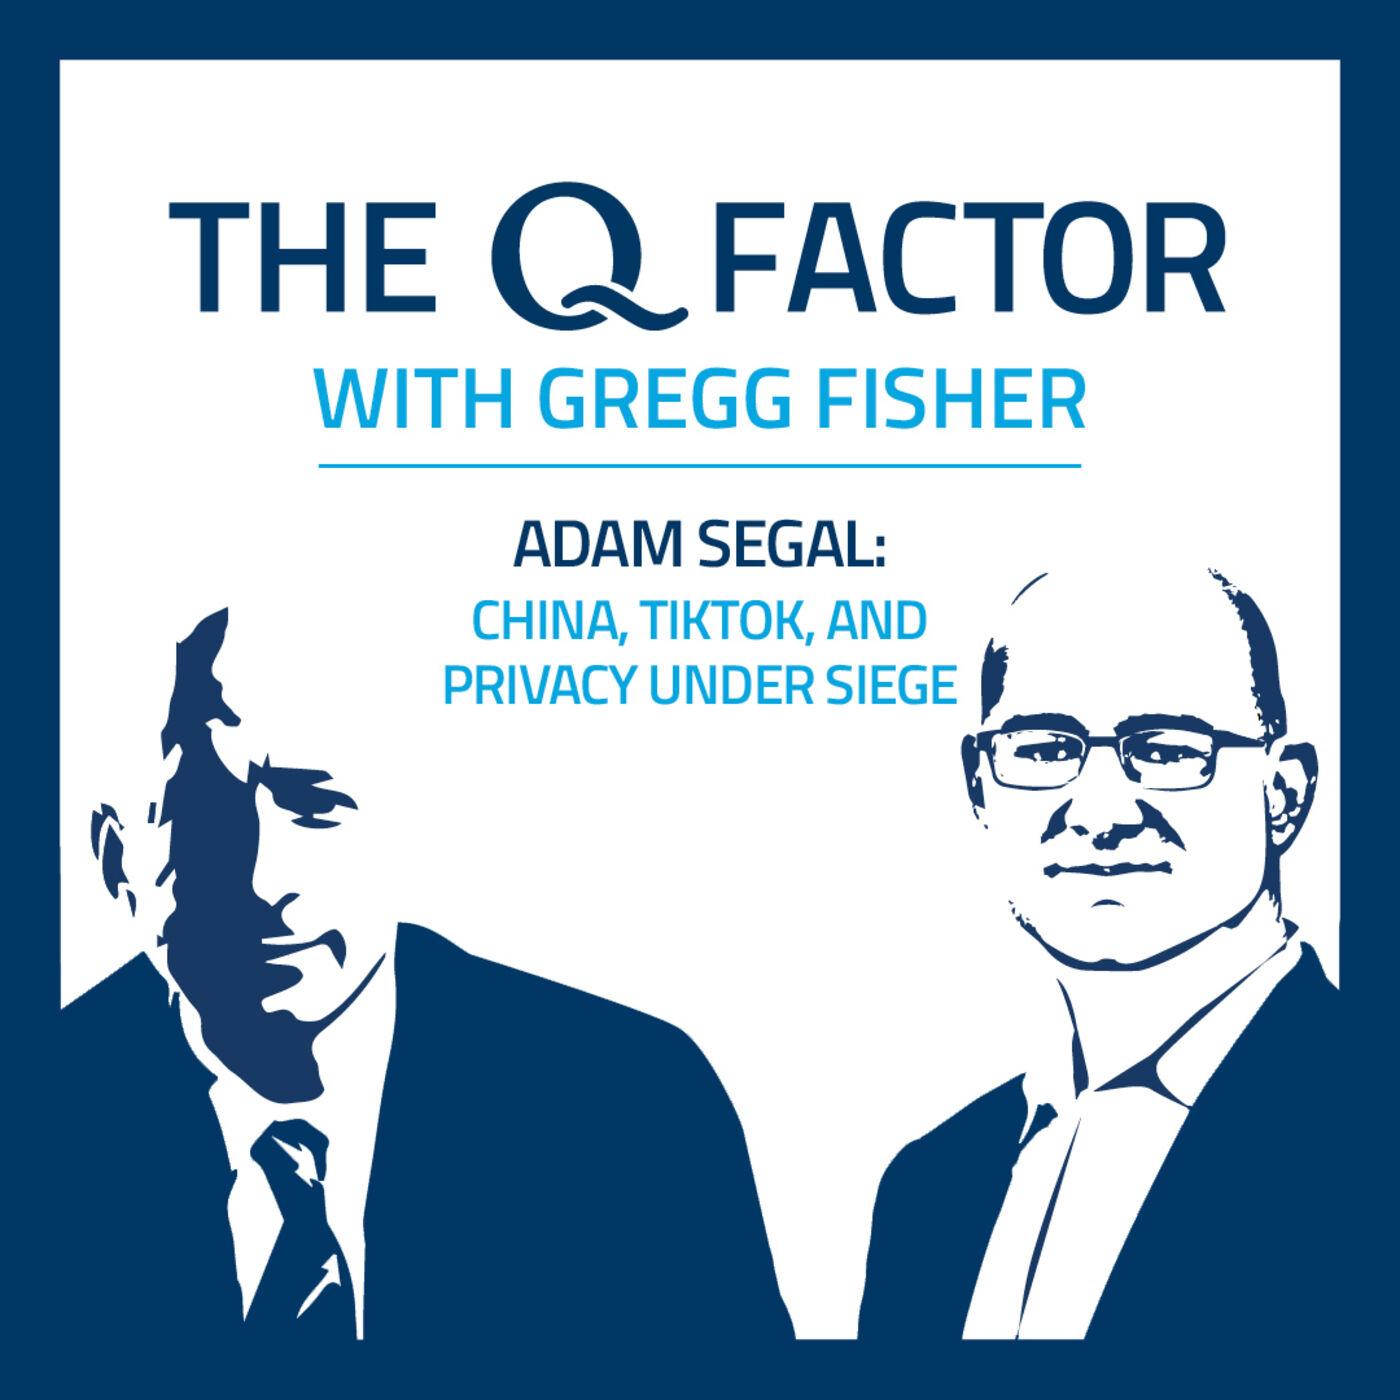 ADAM SEGAL: CHINA, TIKTOK, AND PRIVACY UNDER SIEGE